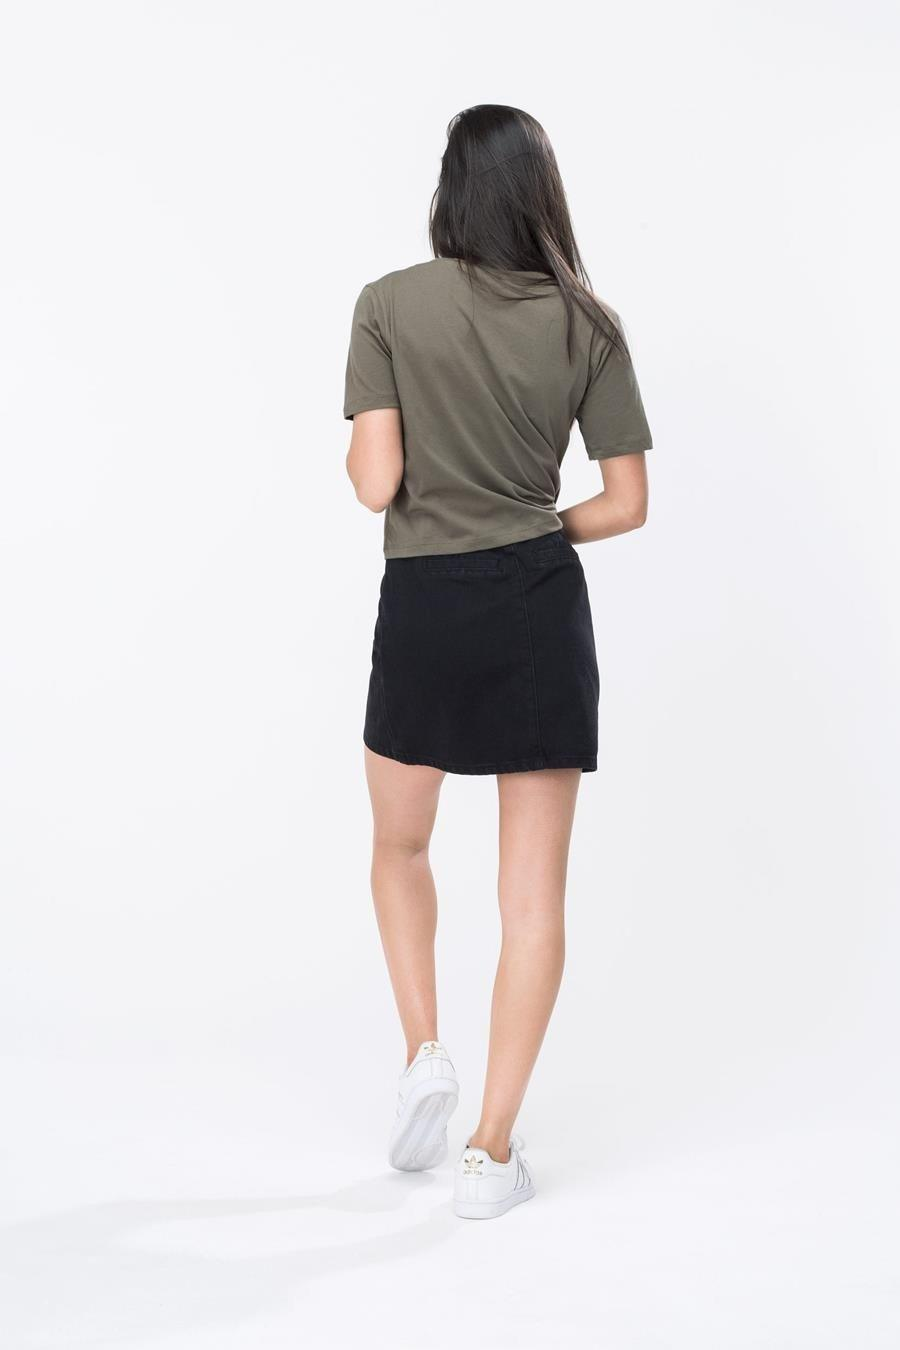 HYPE Khaki/White Hype Script Women's Crop T-Shirt